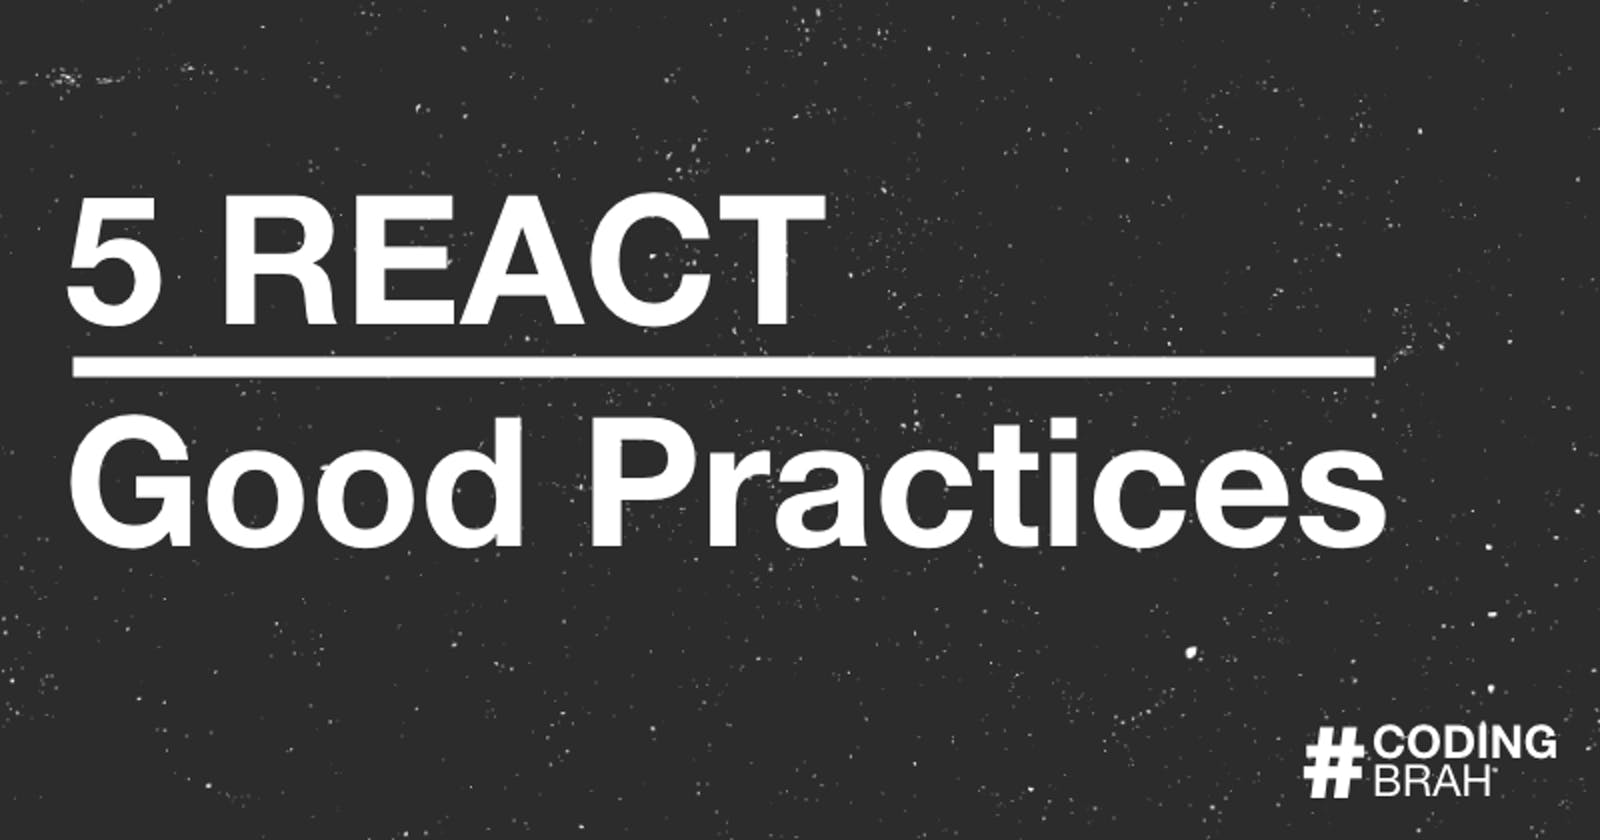 5 React Good Practices